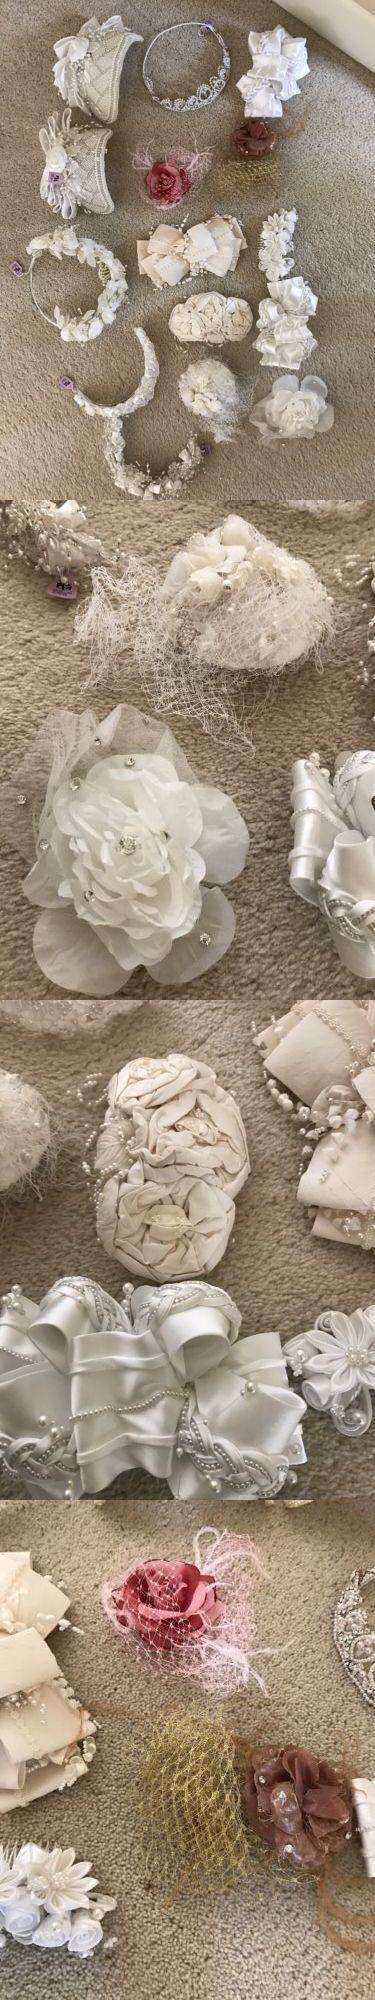 Bridal Accessories: Lot Of 15 Women Wedding Bride Hairband Pearl Tiara Rhinestone Headband Headdress BUY IT NOW ONLY: $99.99